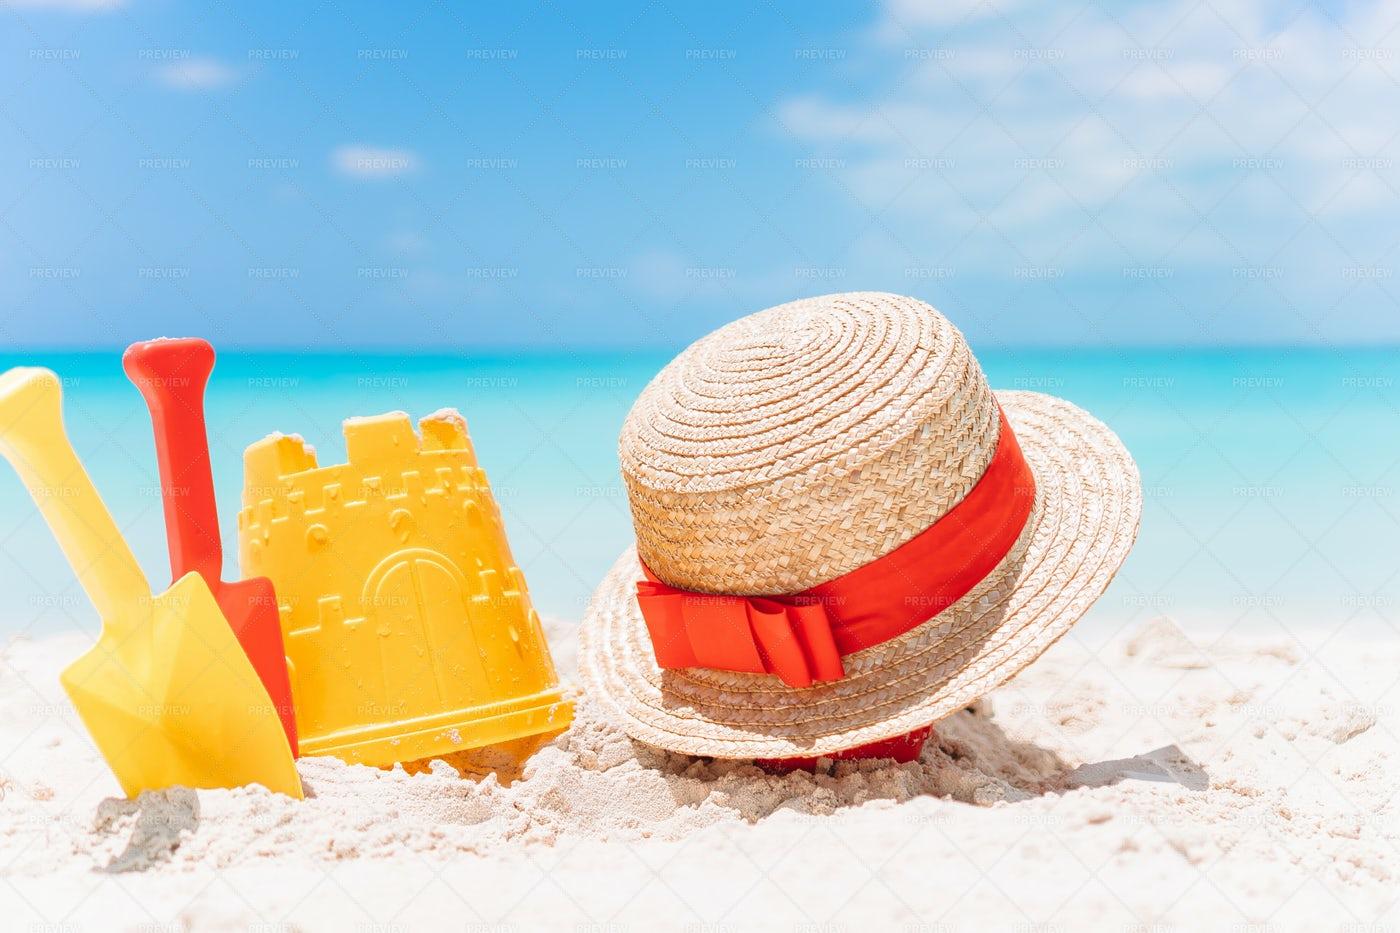 Beach Kid's Toys On White Sand Beach: Stock Photos